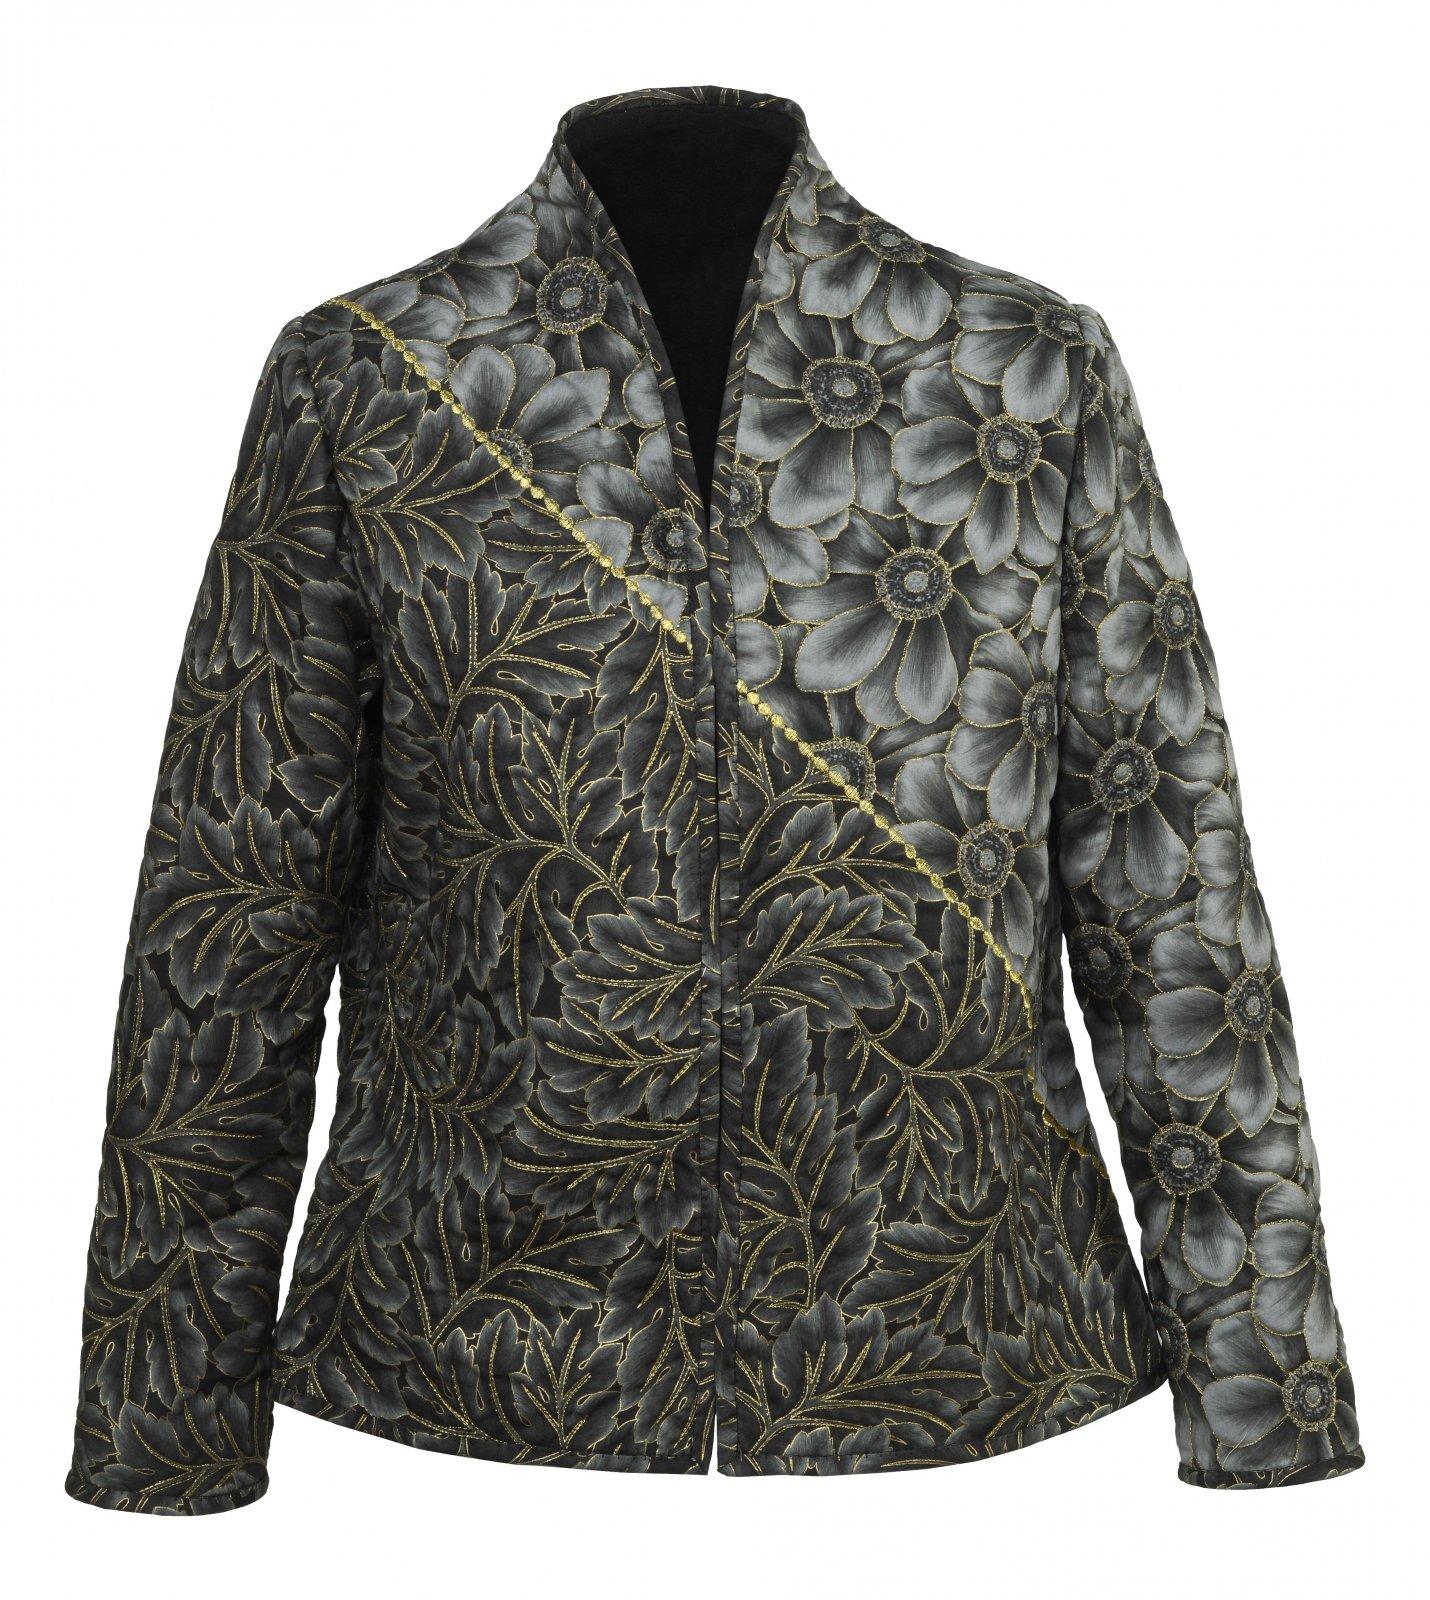 FFQ Queen Anne Elegance Fleece-Based Jacket